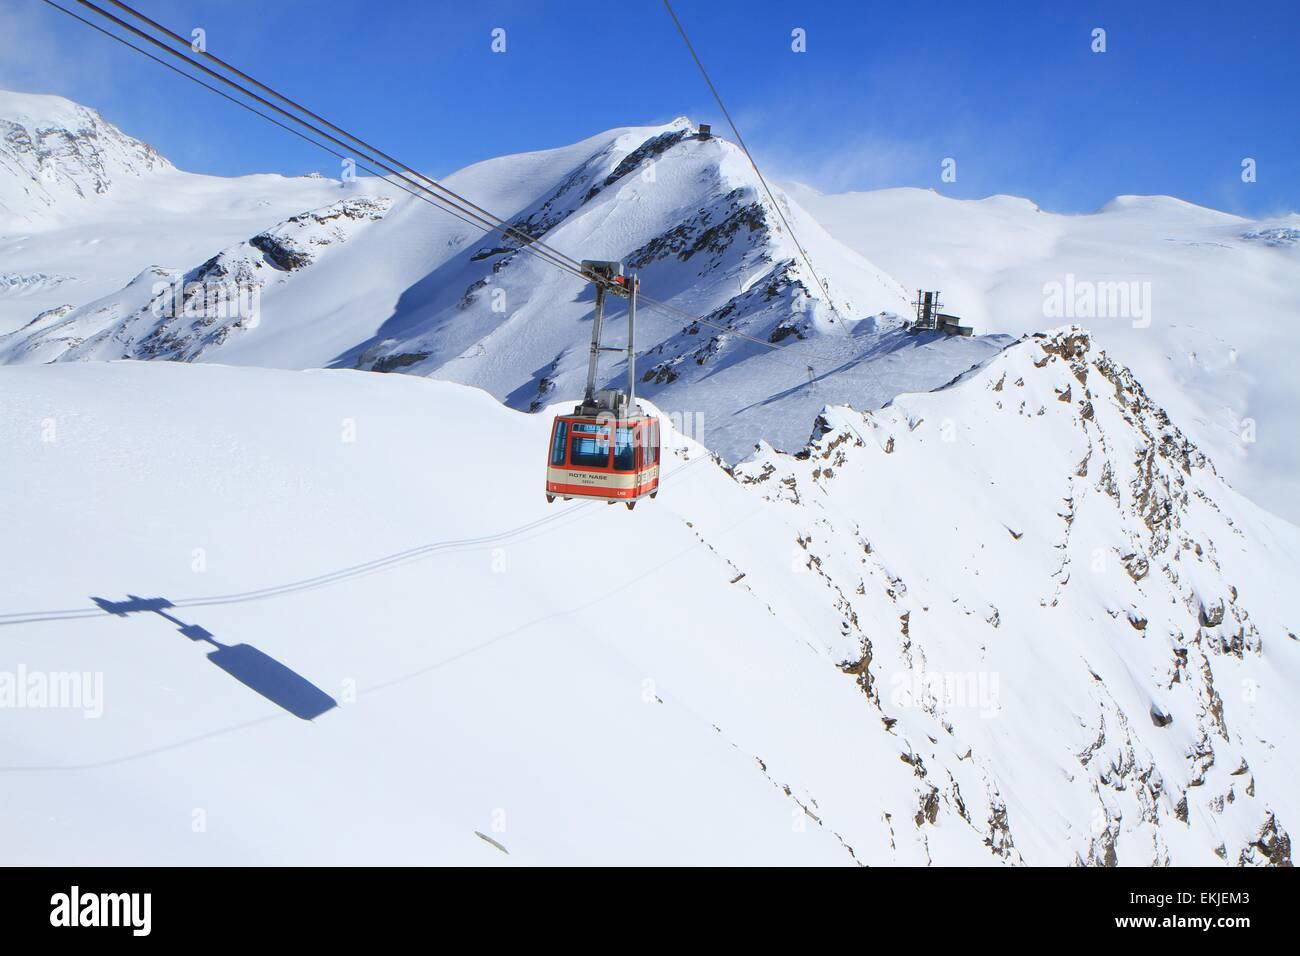 Rote Nase cable-car, Zermatt, Alps, Switzerland Stock Photo